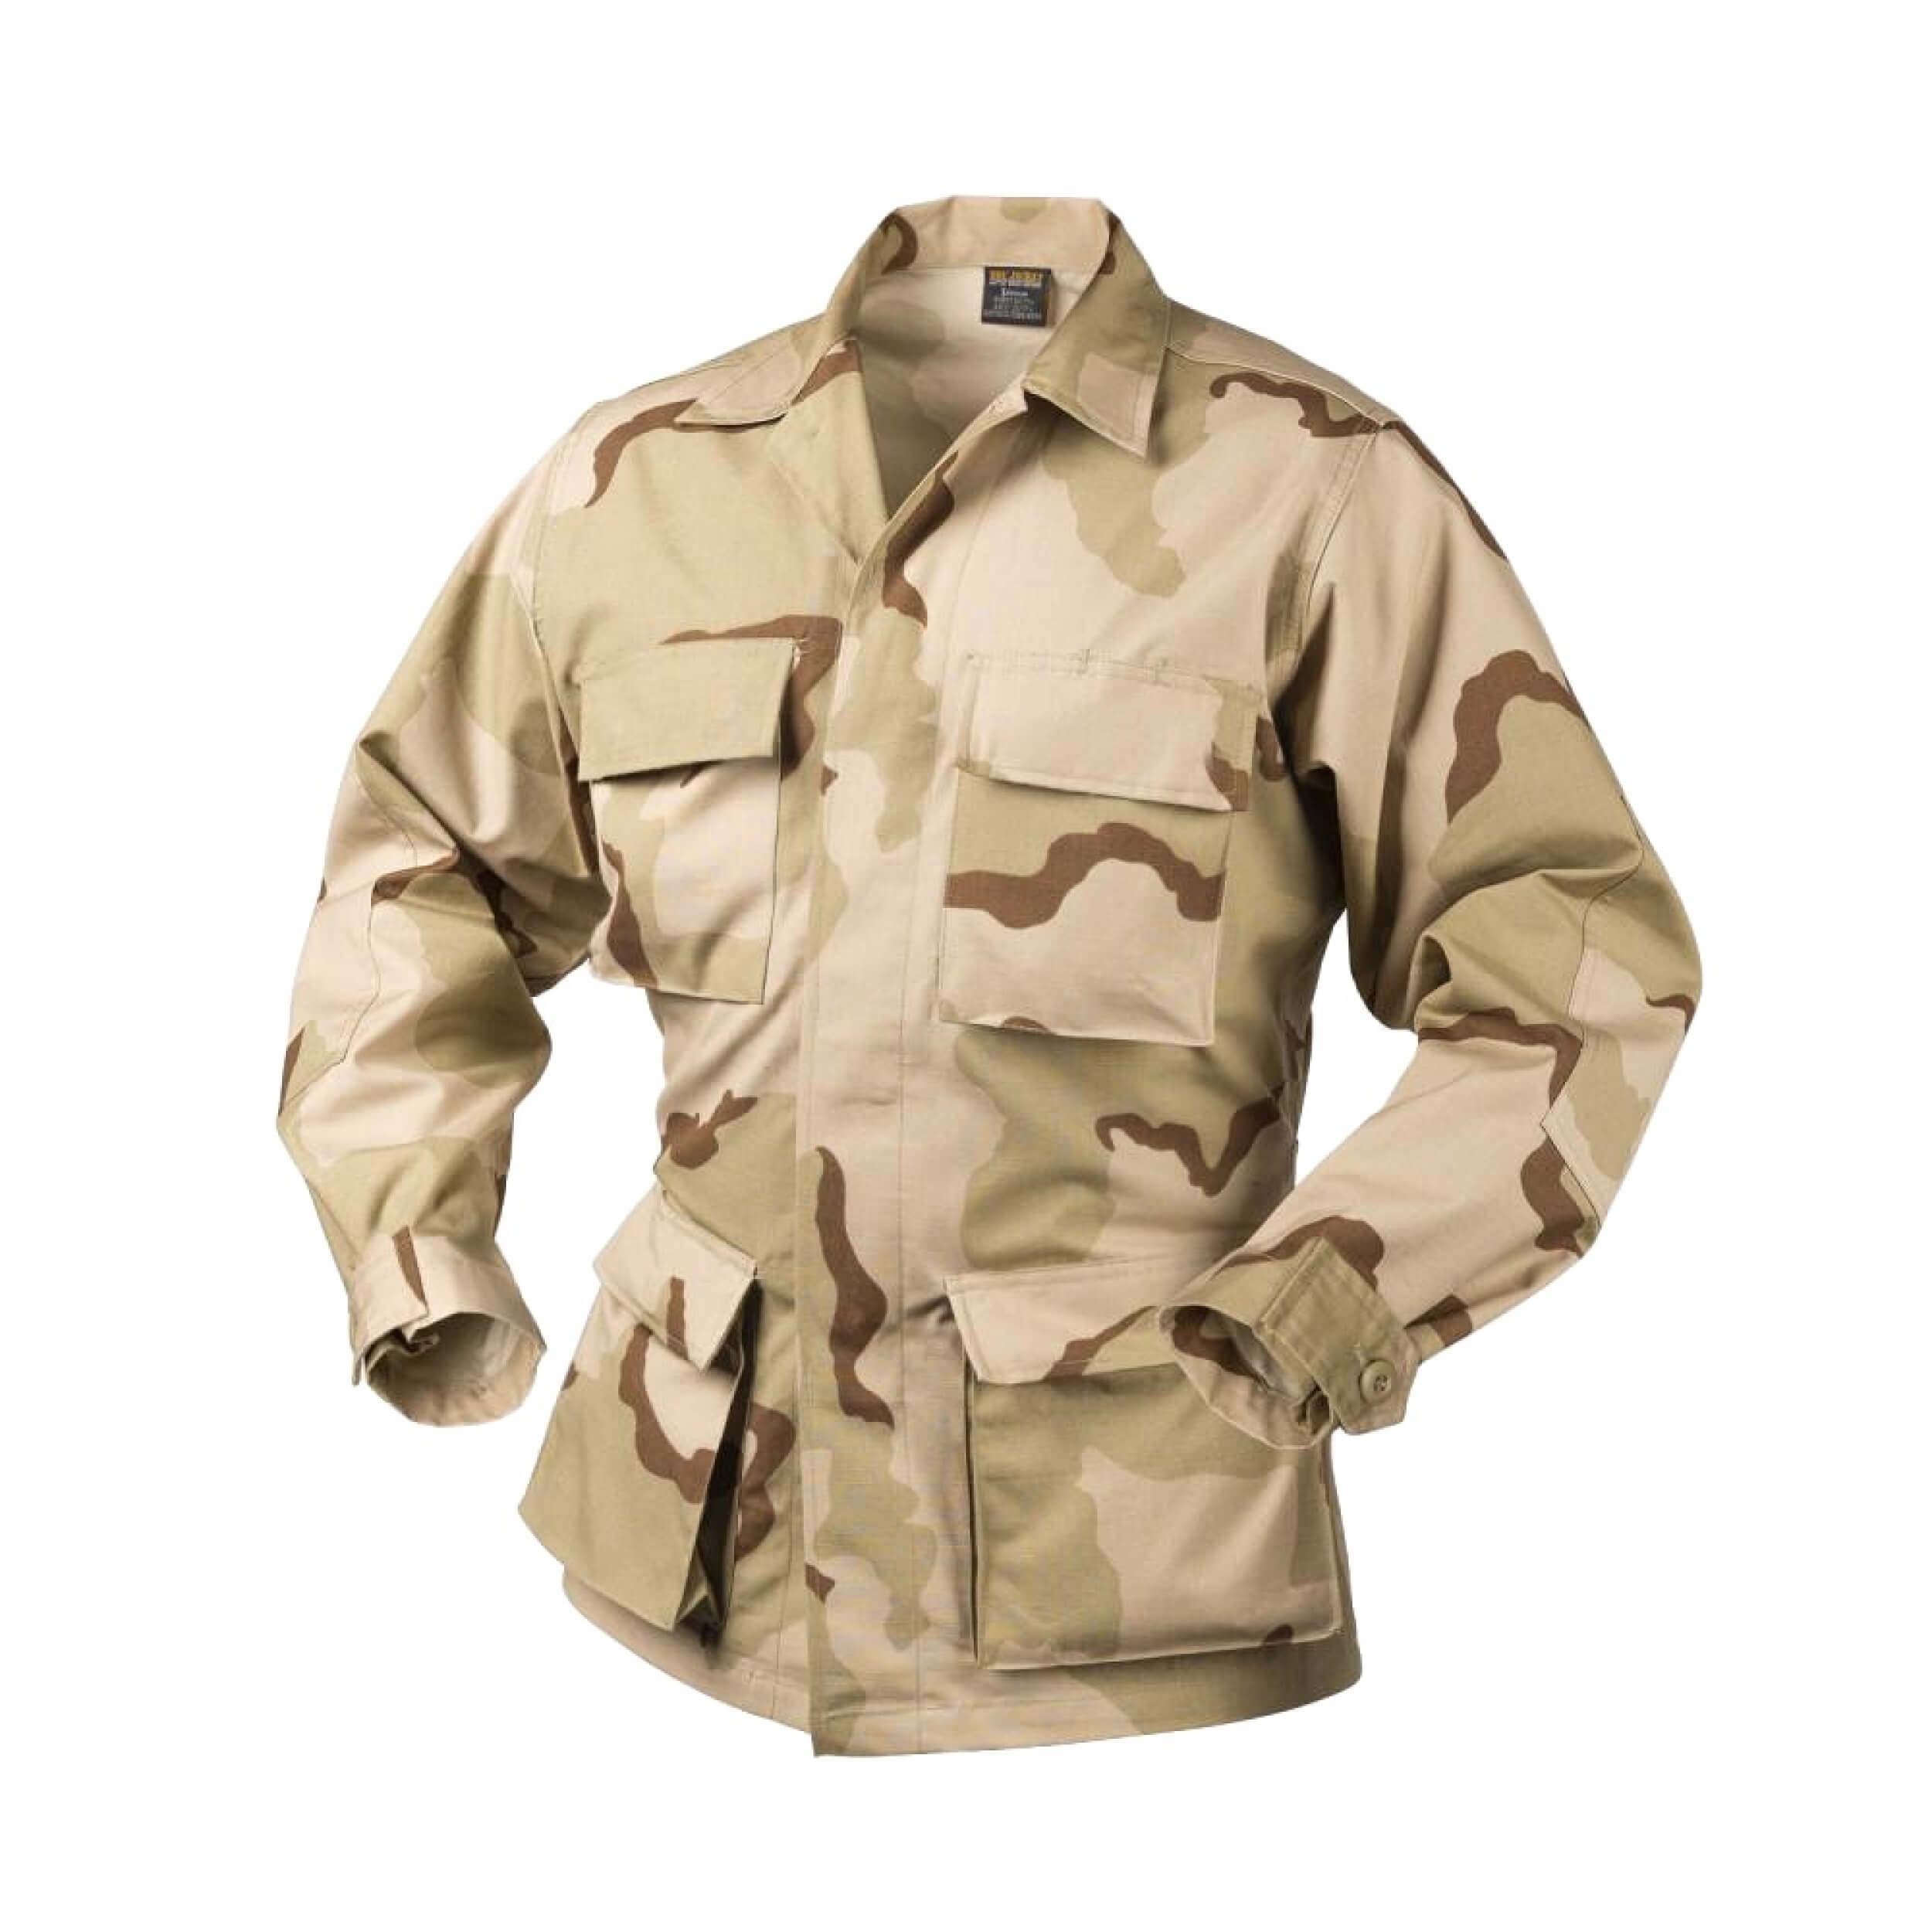 Helikon-Tex BDU Shirt - Cotton Ripstop - US Desert